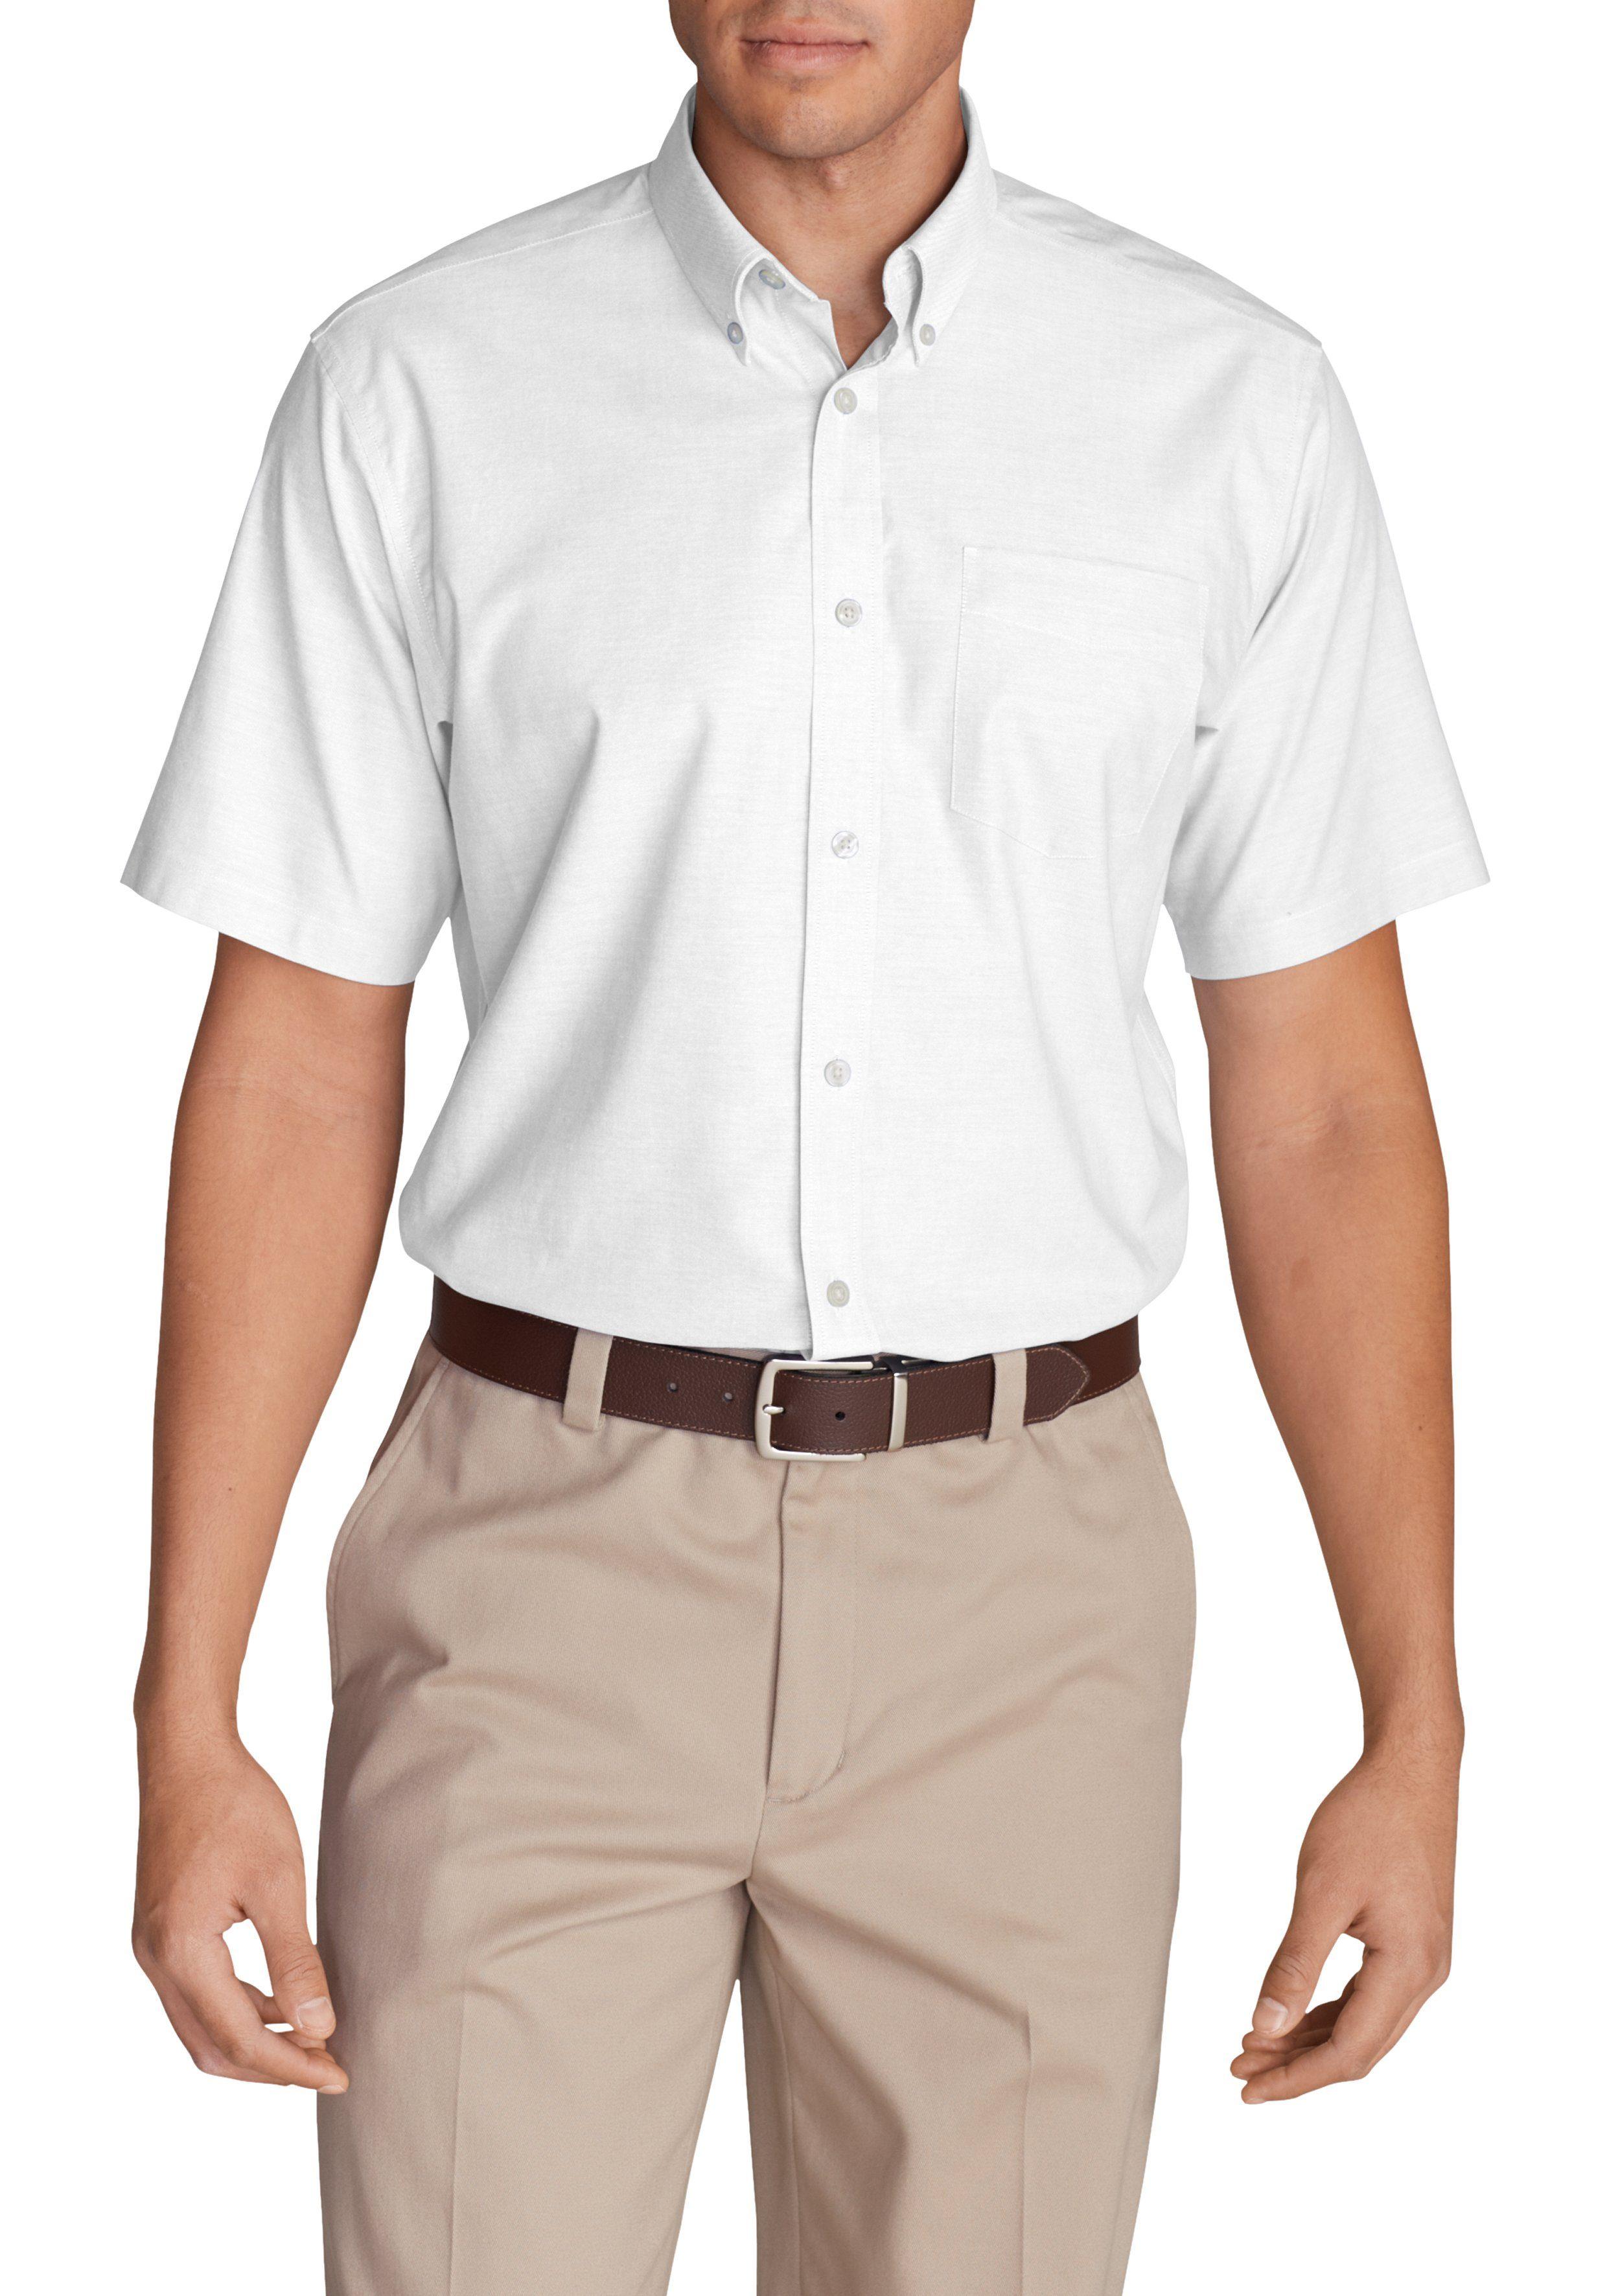 Eddie Bauer Kurzarmhemd Oxfordhemd - Relaxed fit - Kurzarm - uni